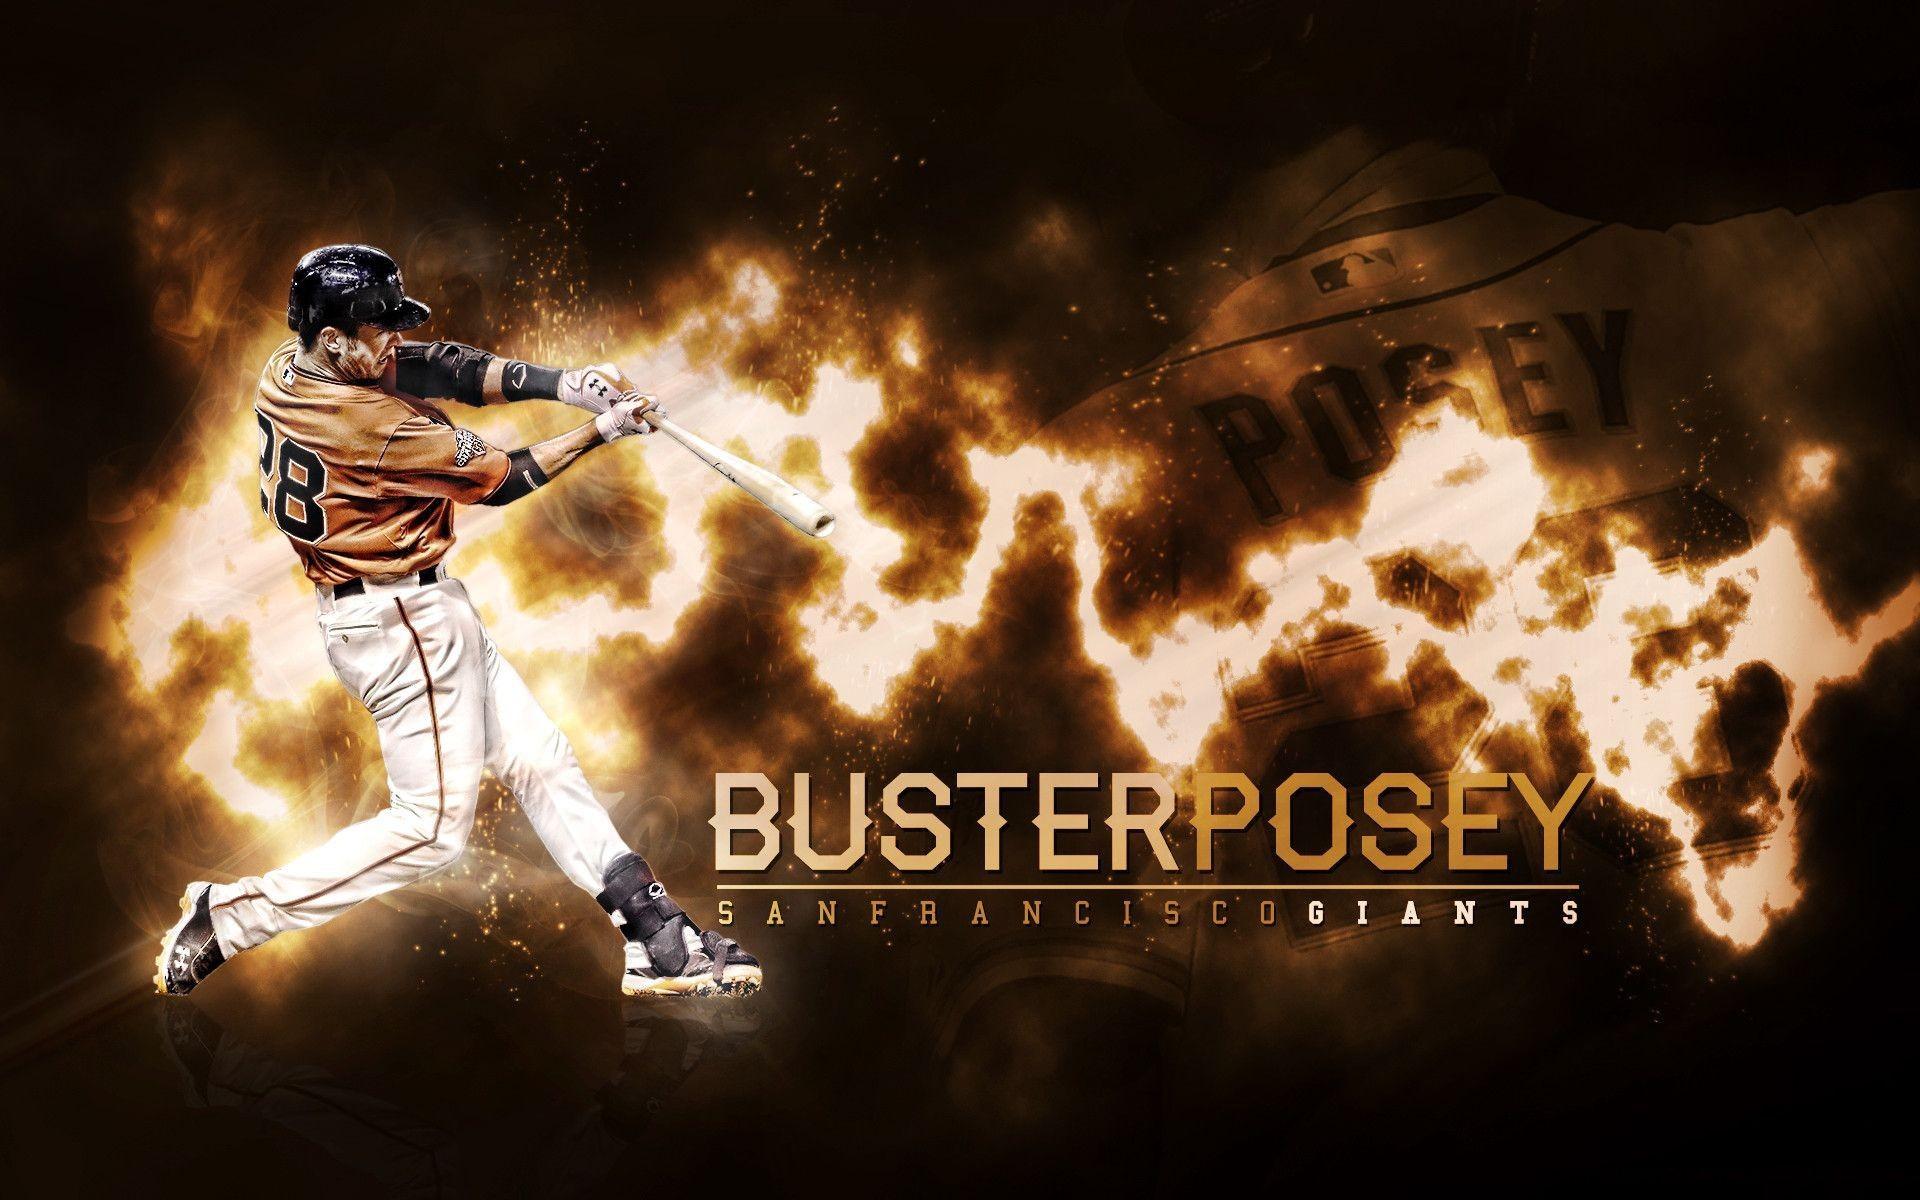 Buster Posey Wallpaper Widescreen.